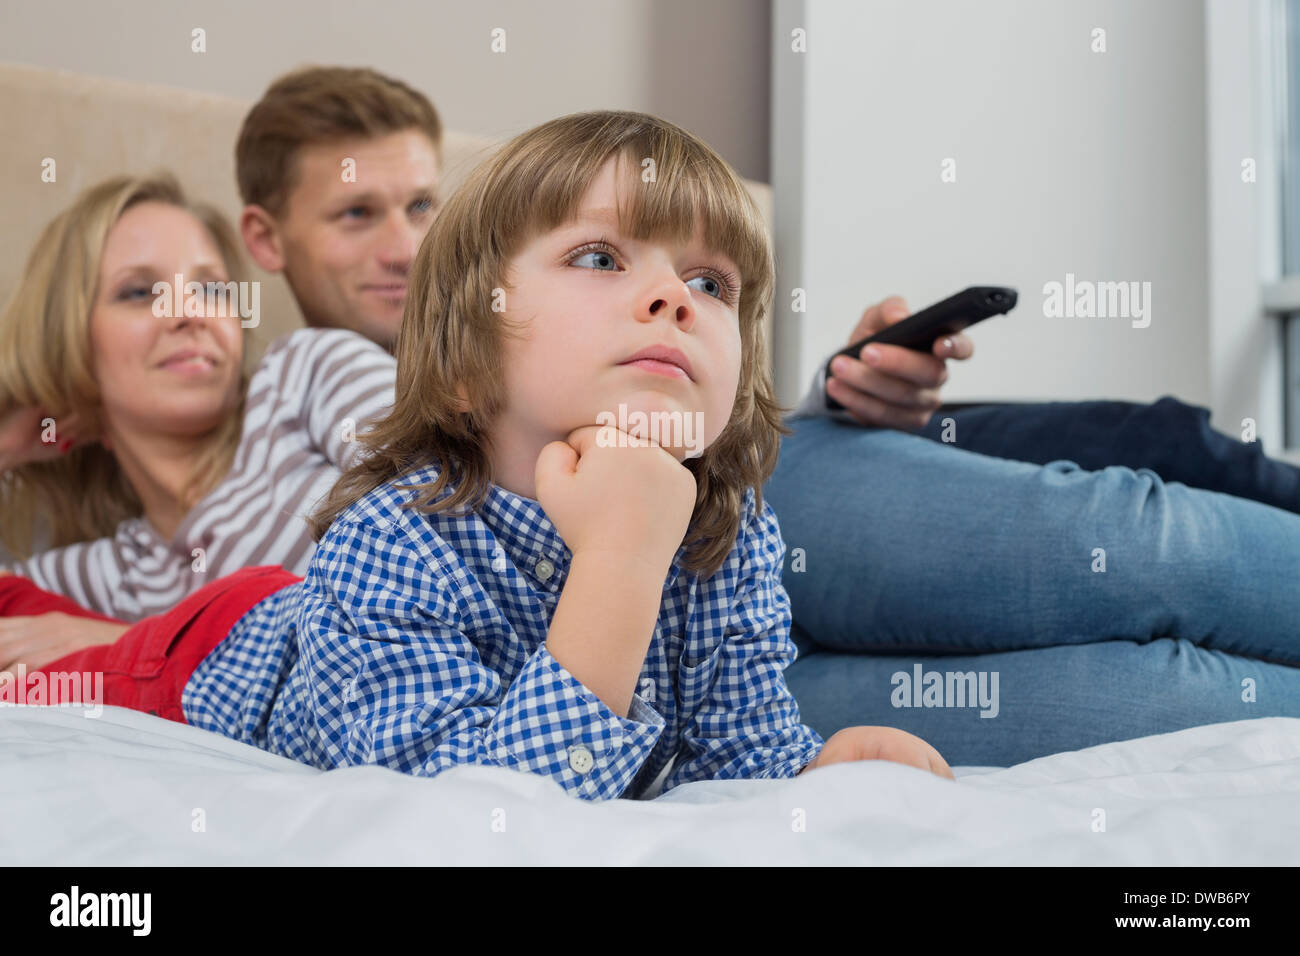 Family watching TV in bedroom - Stock Image